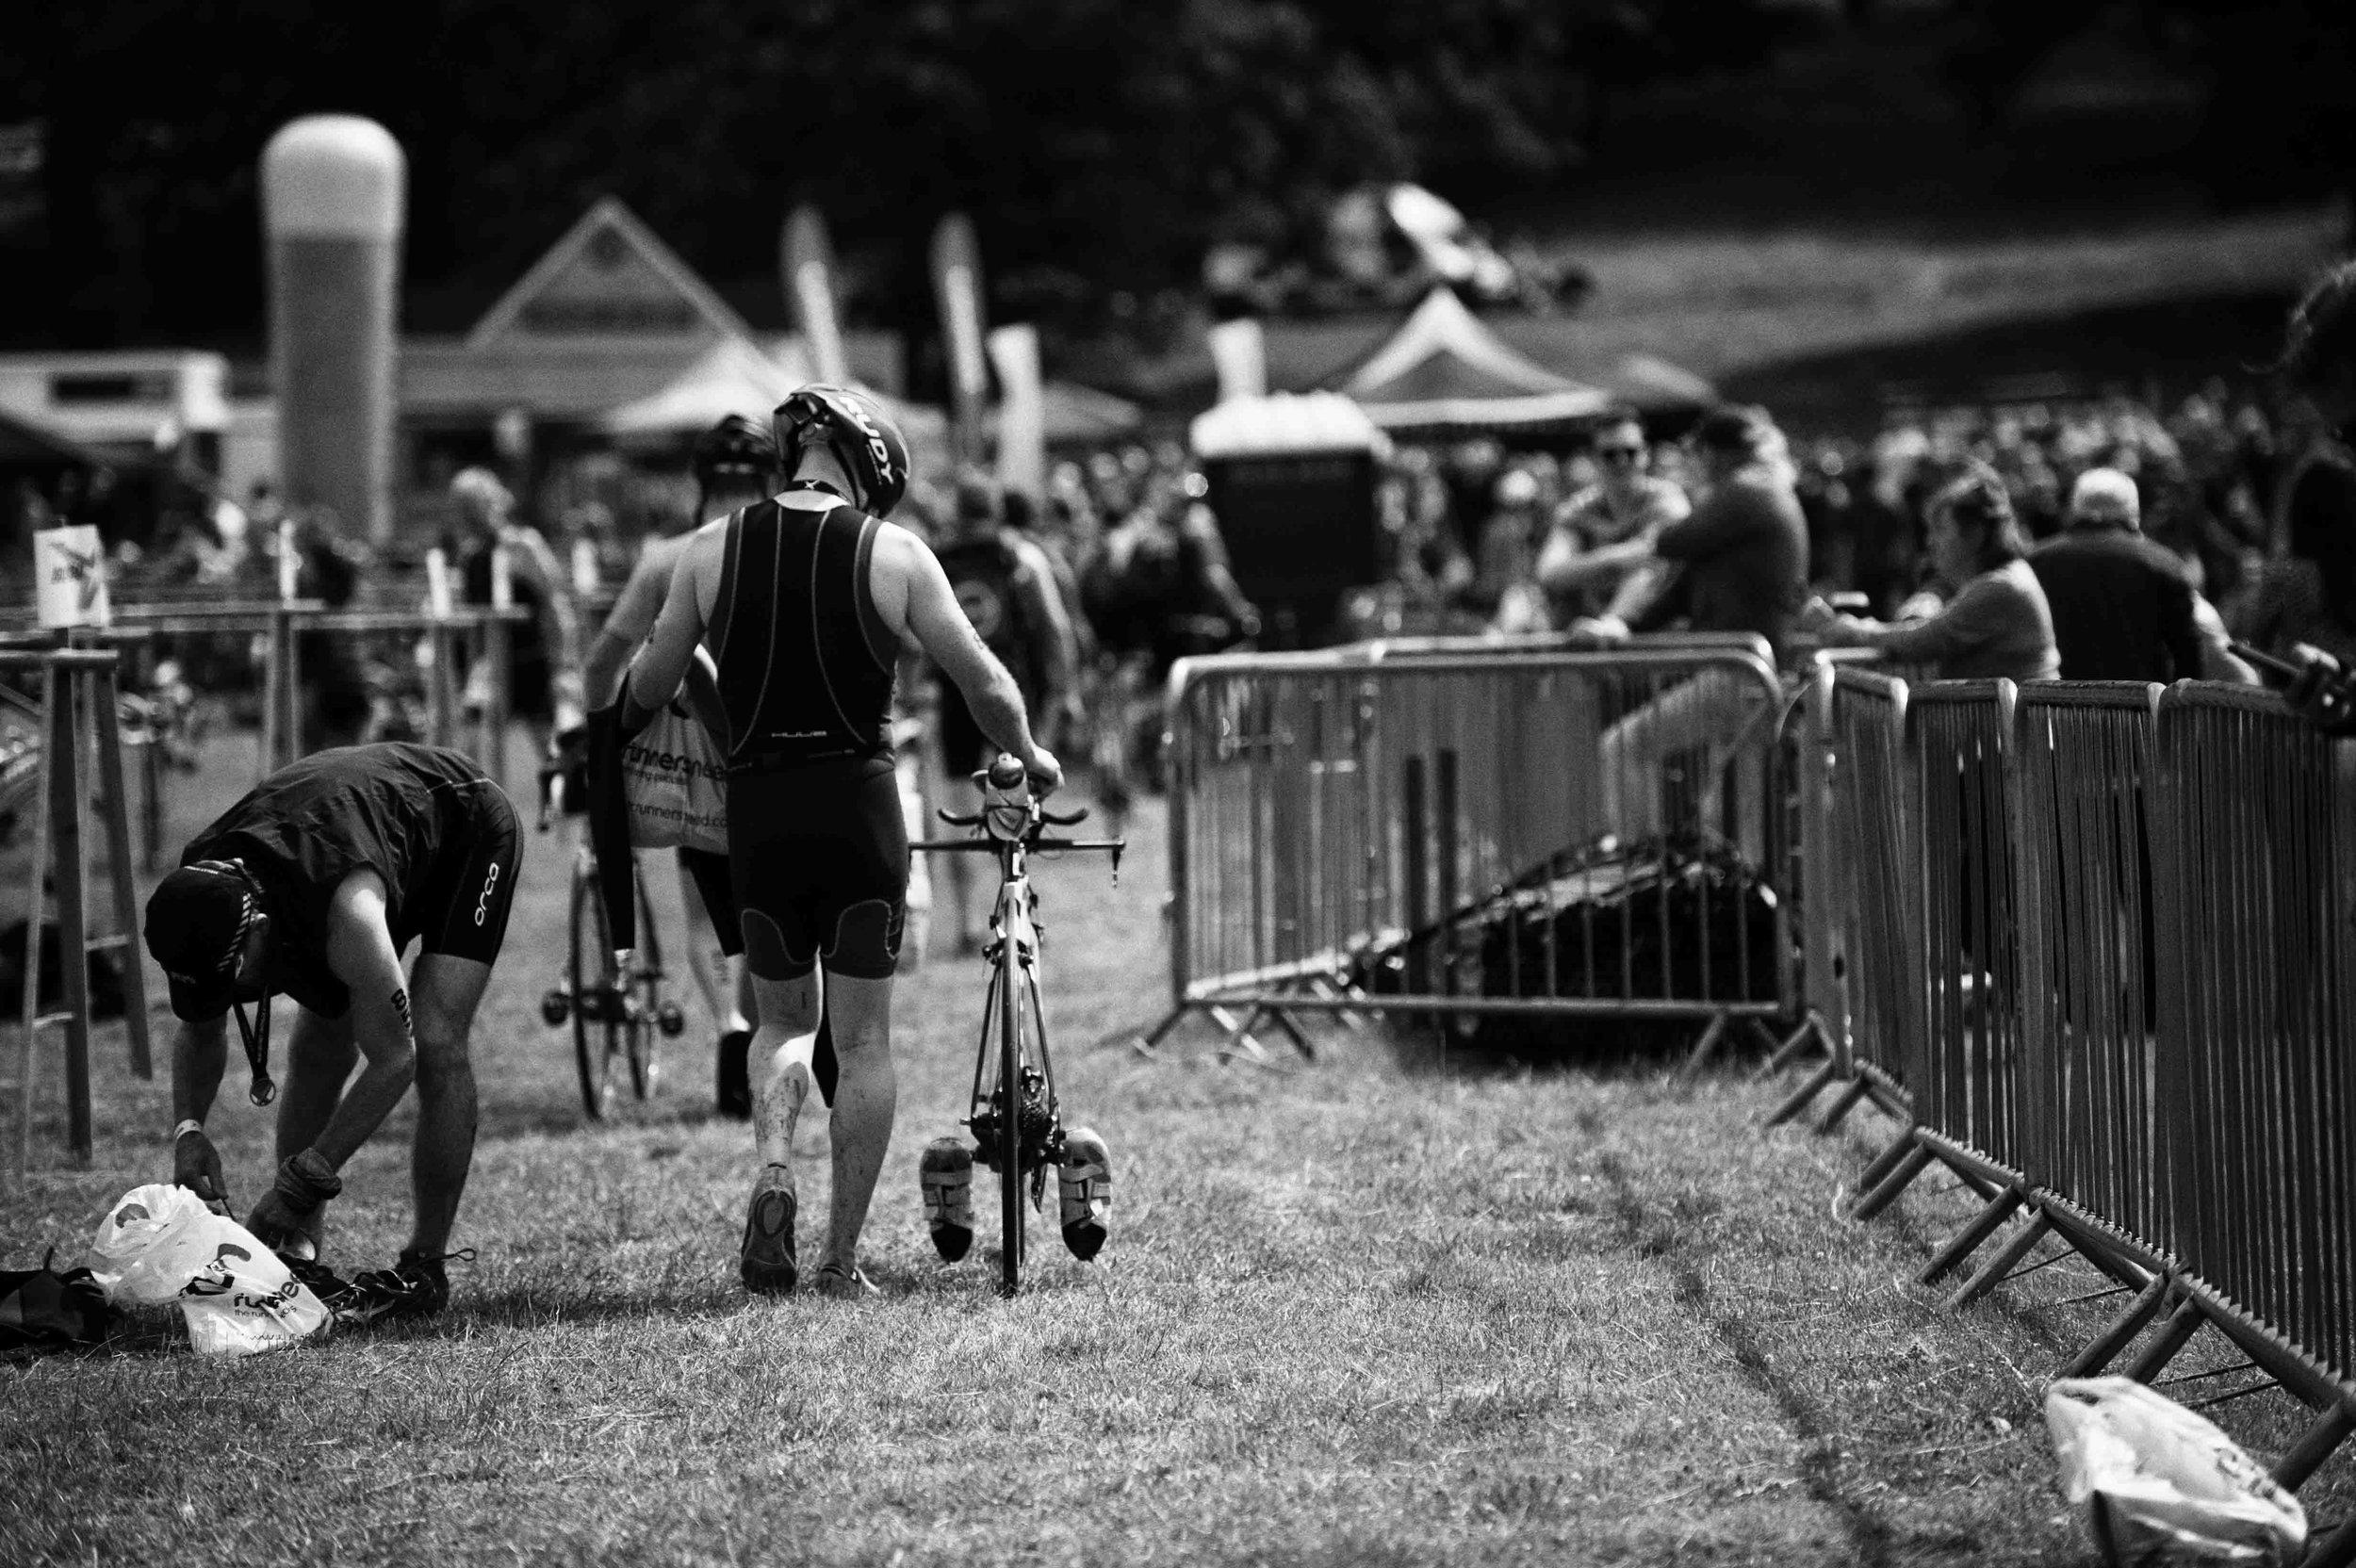 AT_Golf Photos Aniko Towers Chatsworth triathlon 2016-140.jpg